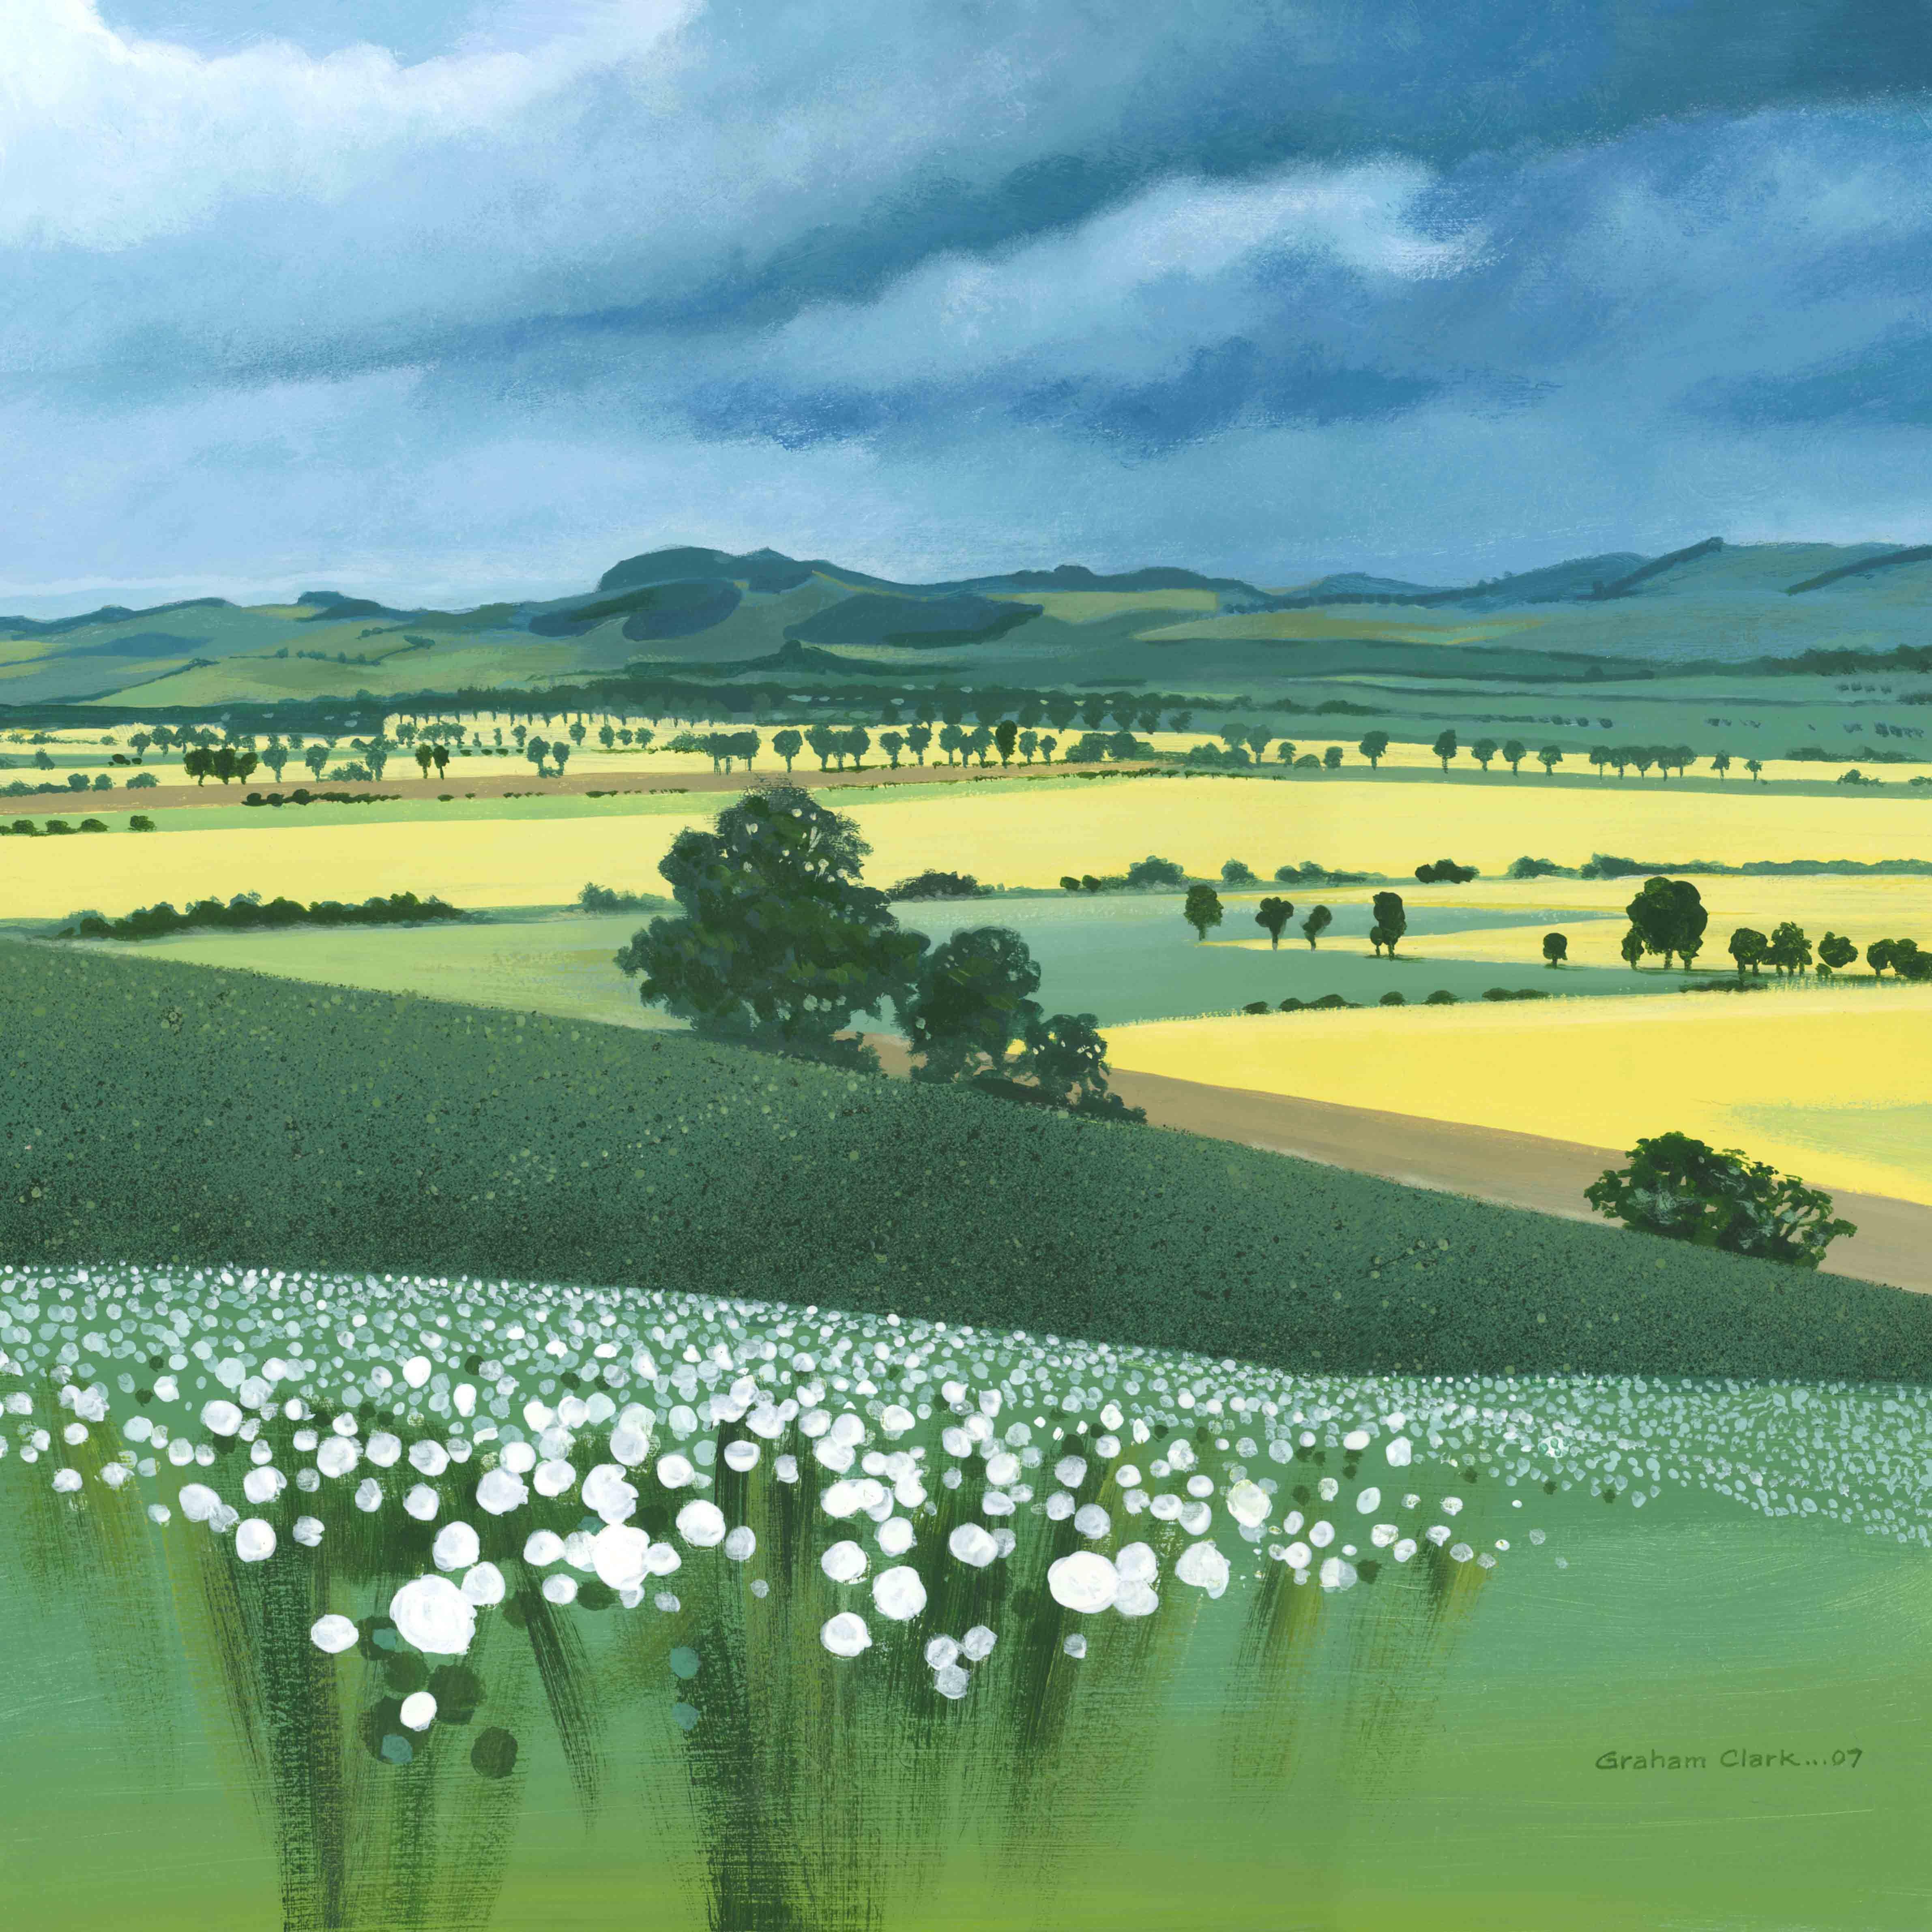 Kingdom of Fife by Graham Clark, Acrylic